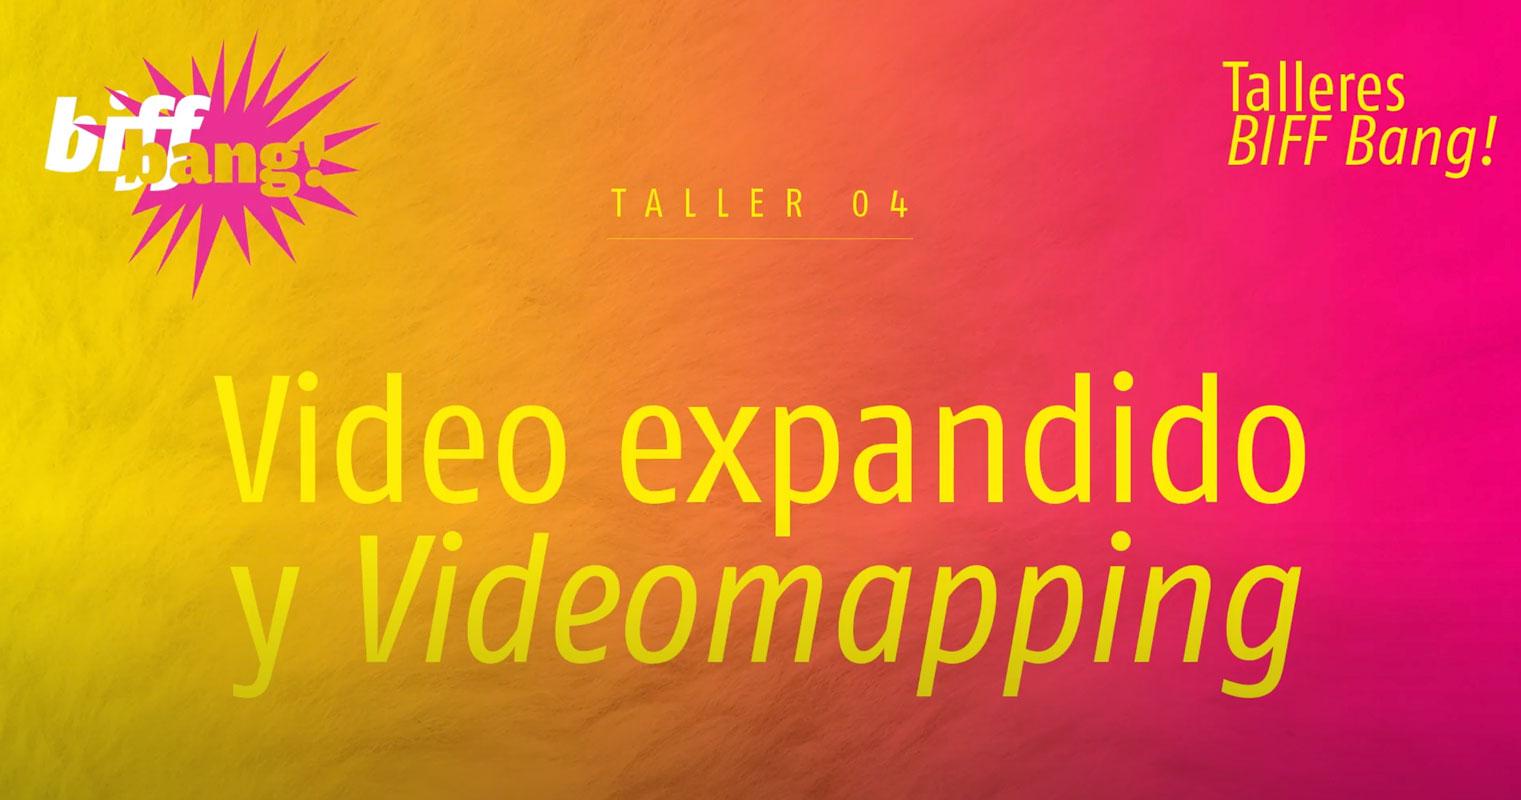 Convocatoria Biff Bang | Taller de video expandido y video mapping